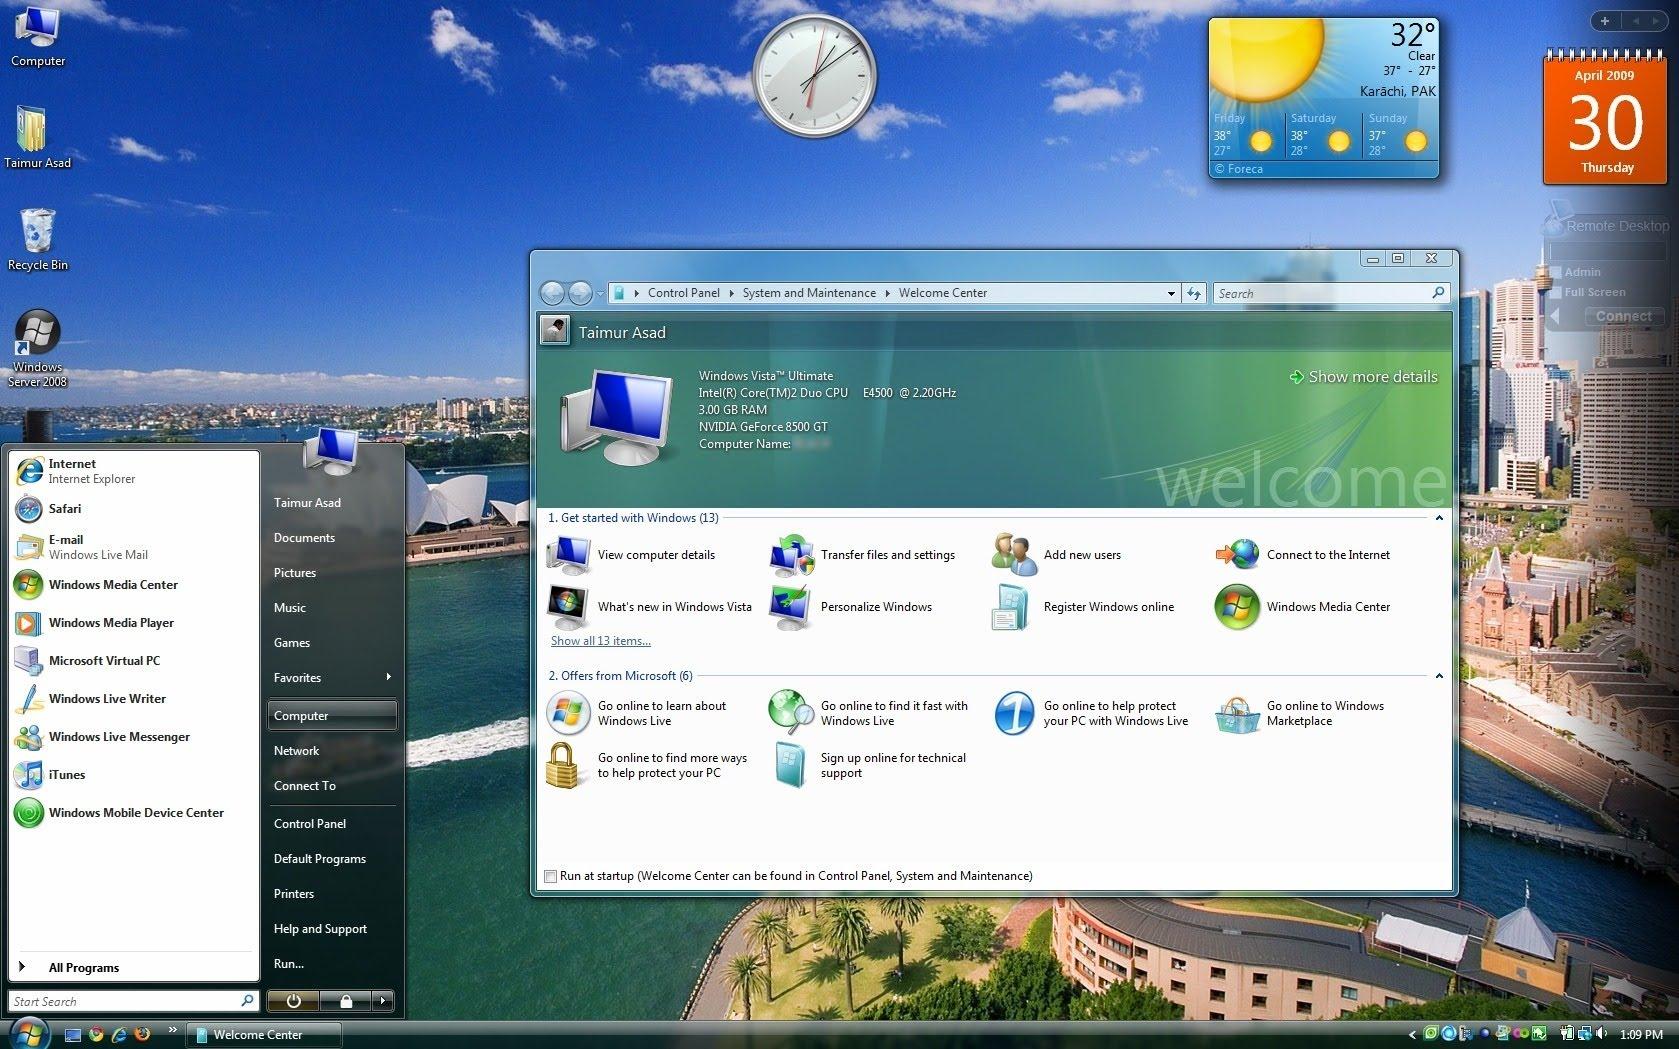 Ubisoft to Discontinue Uplay PC Client for Windows Vista